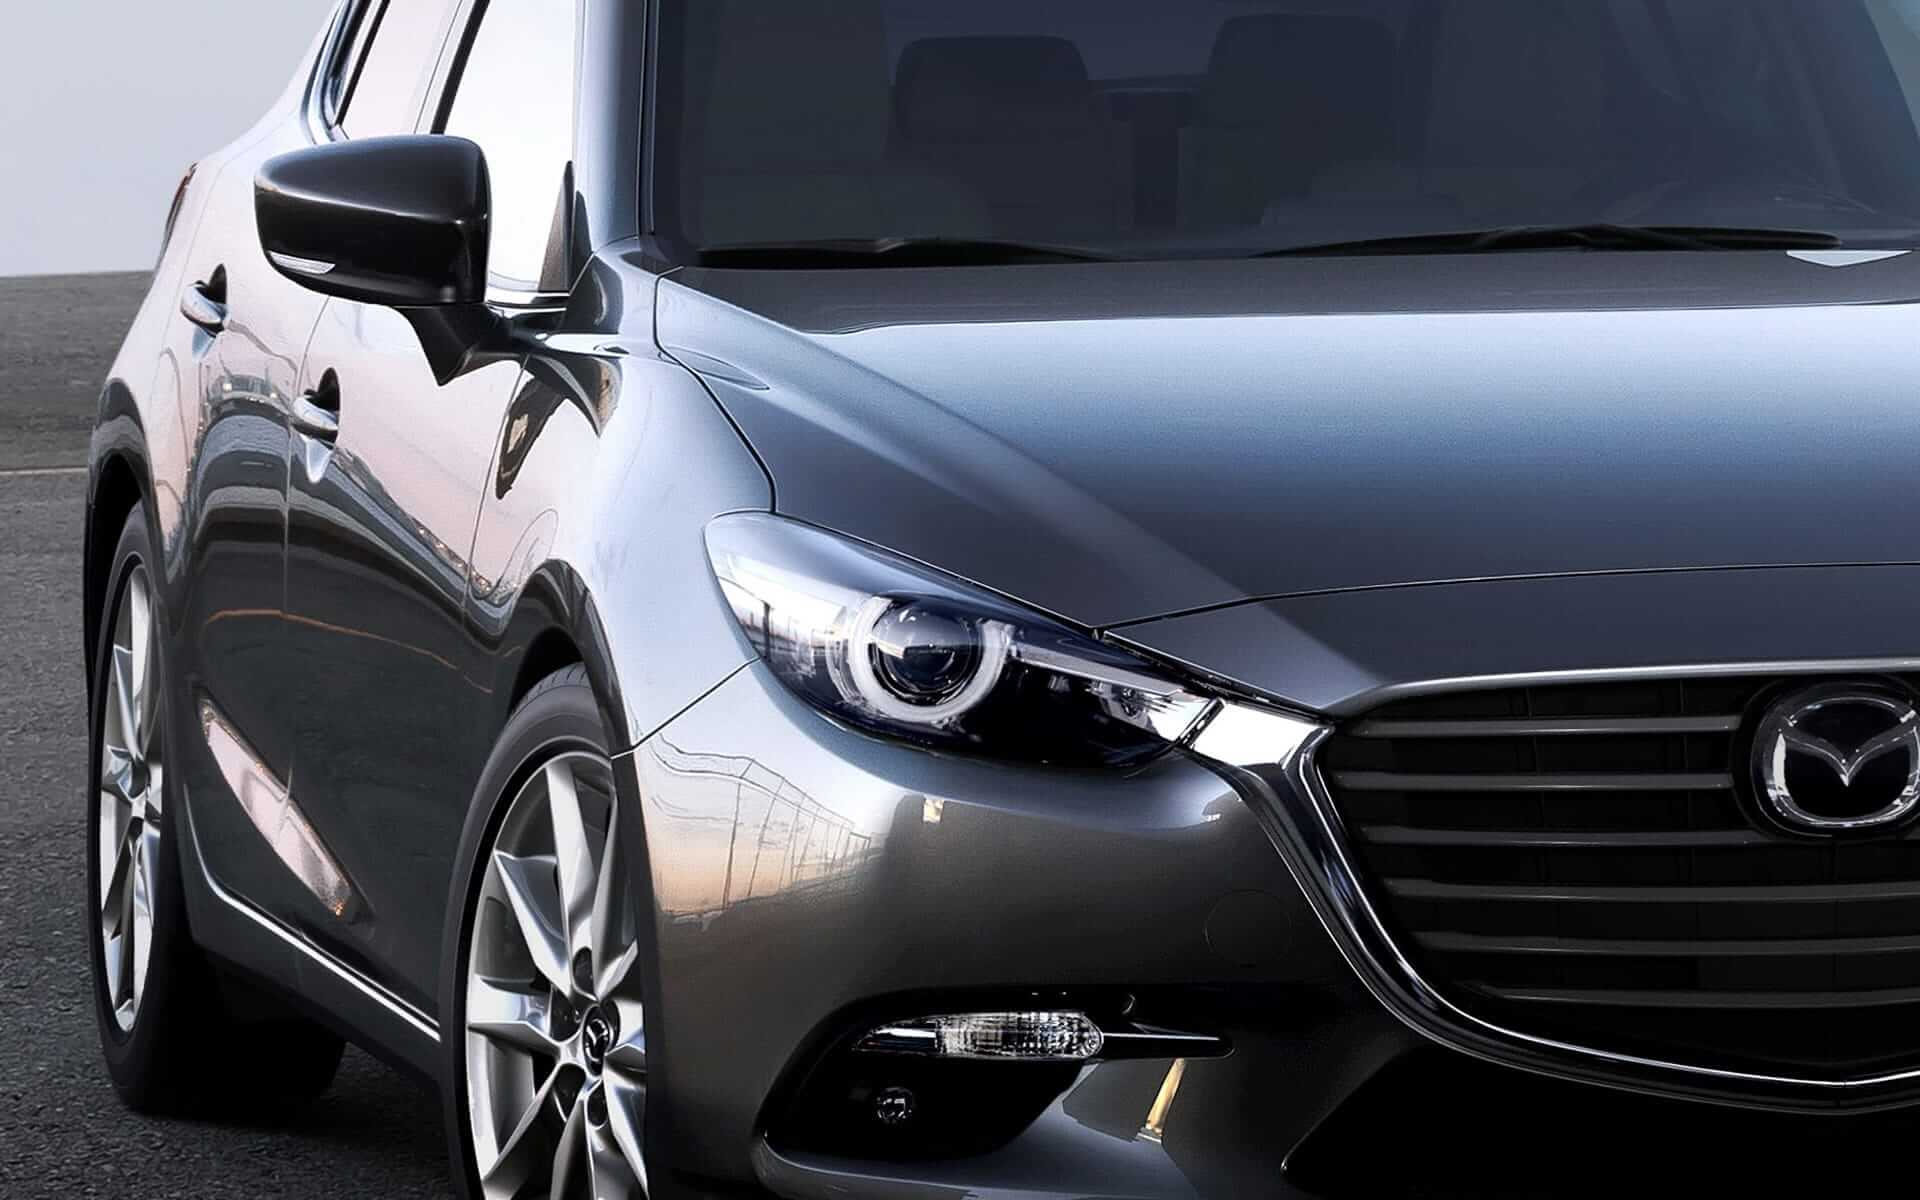 Mazda 3 Hatchback 2017 - Frente del auto – machine grey